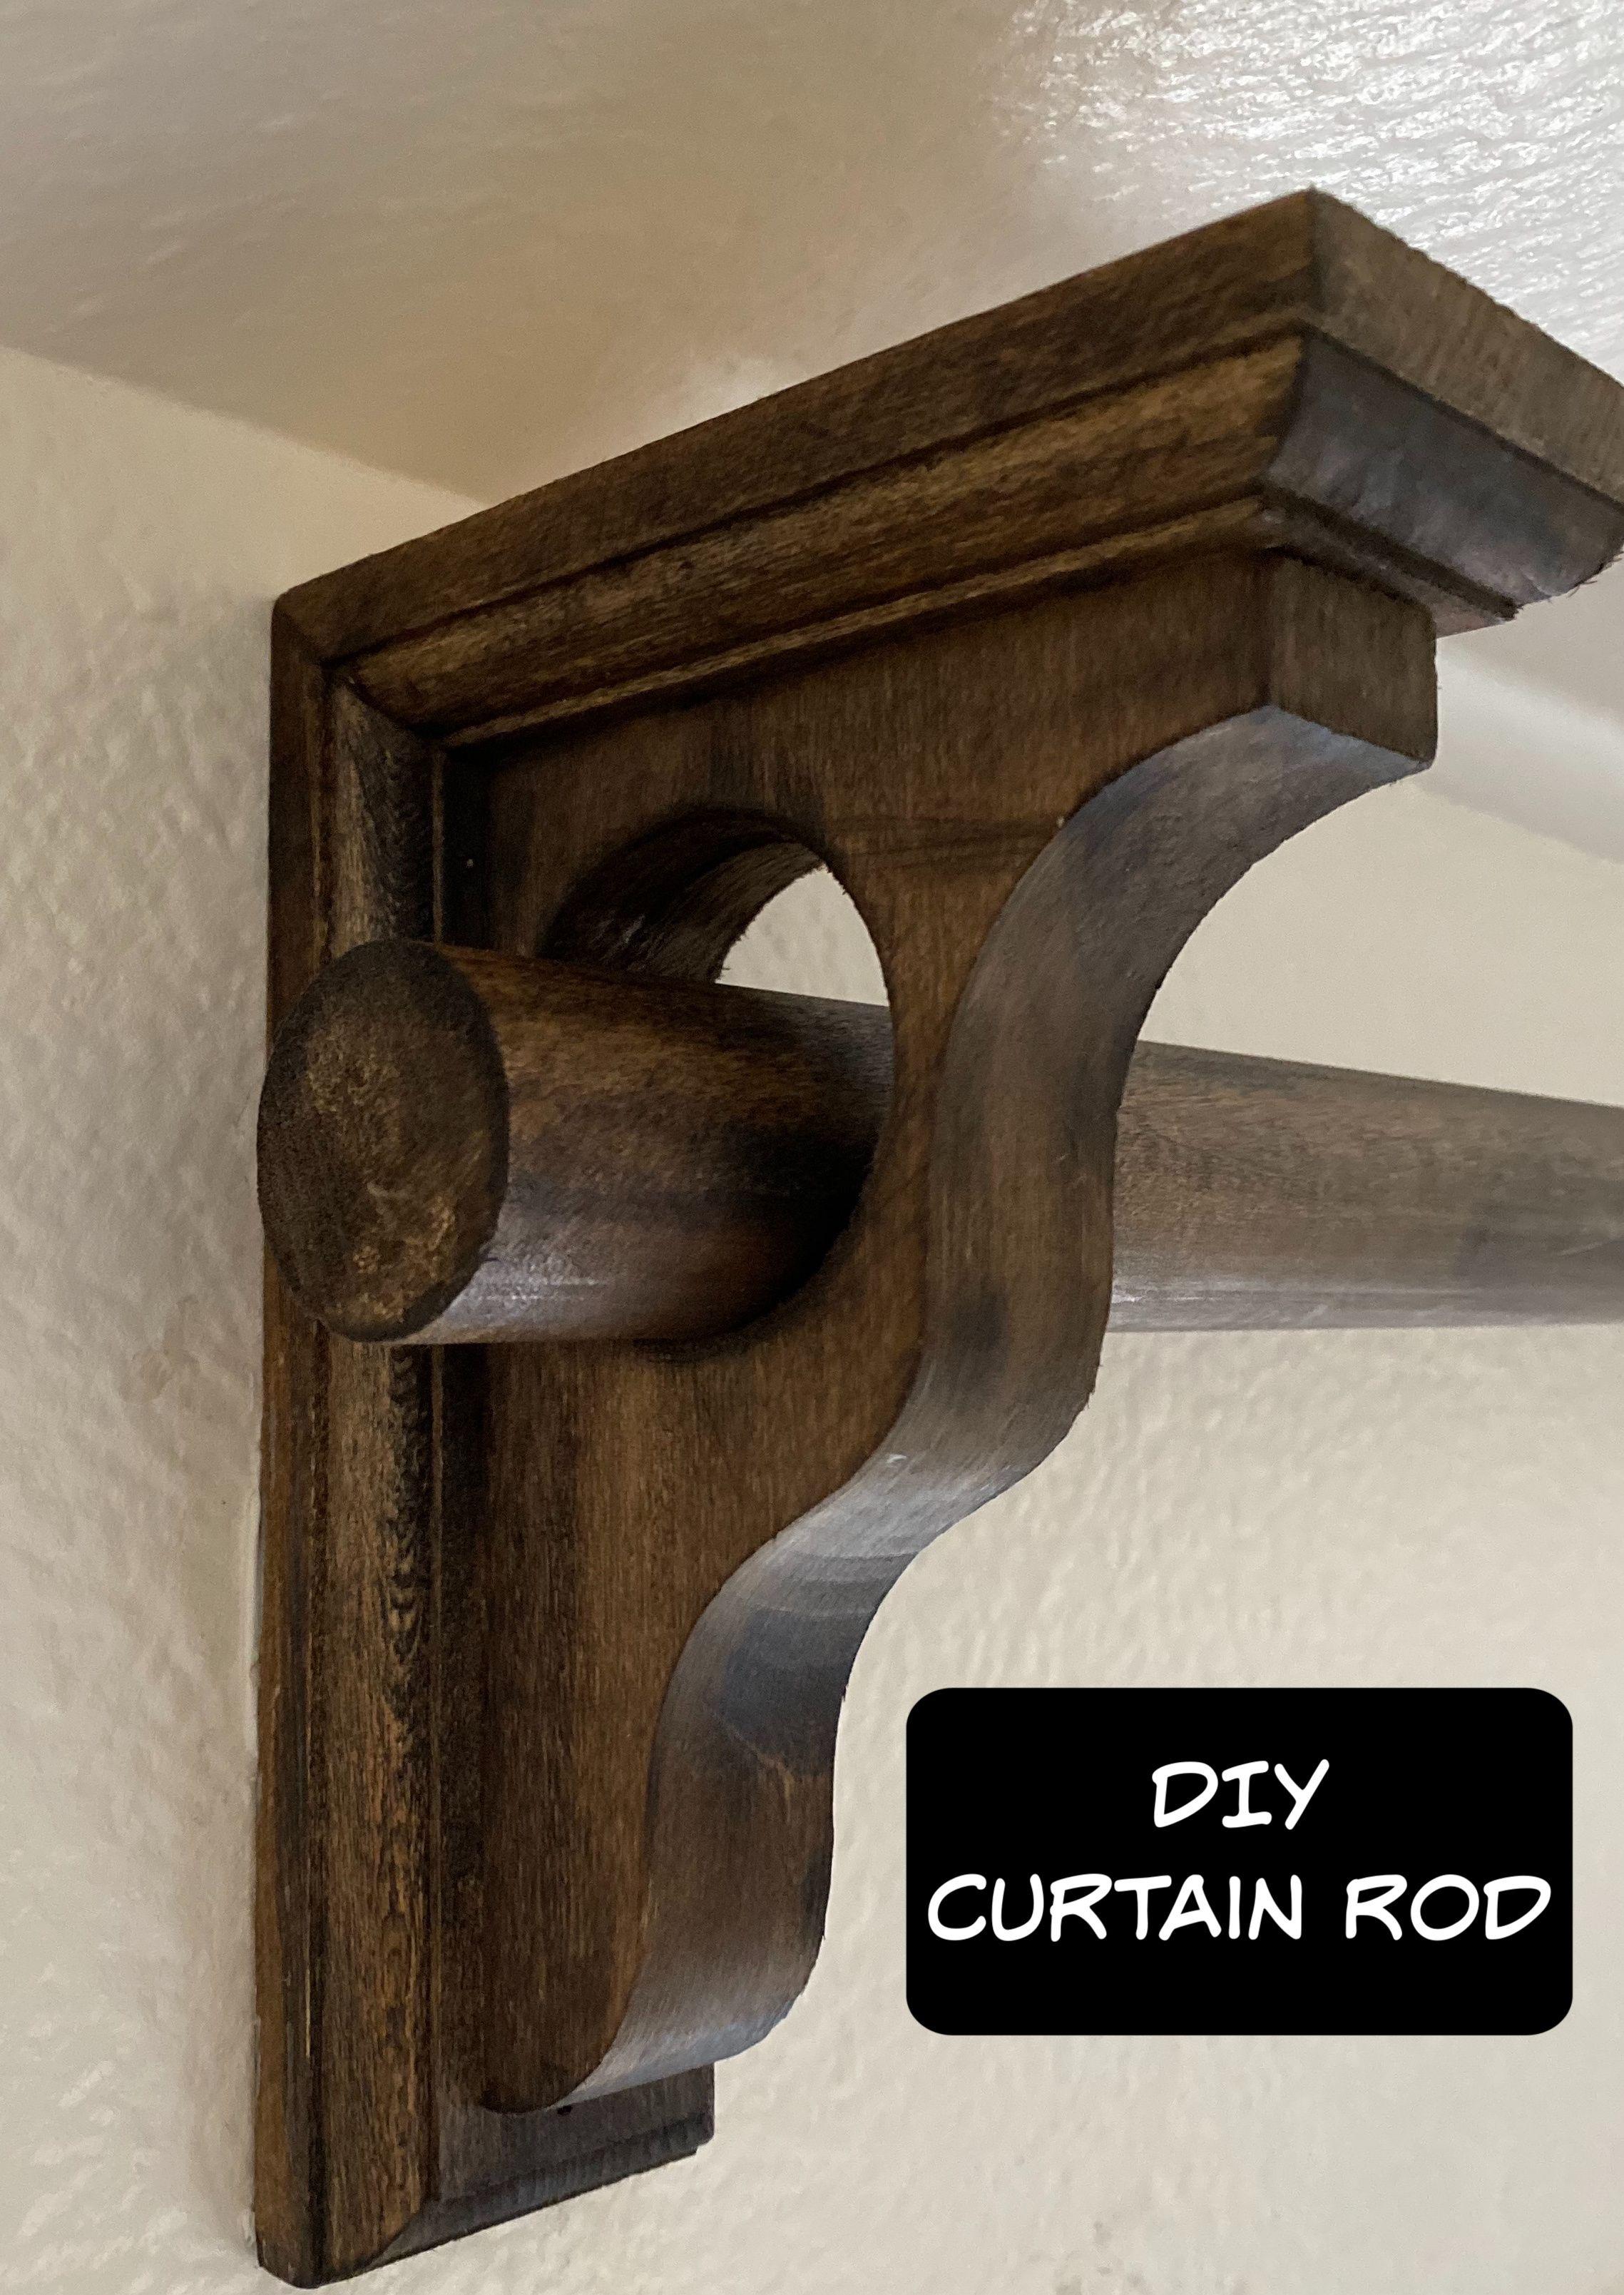 Diy Curtain Rod In 2020 Wood Curtain Rods Diy Curtain Rods Diy